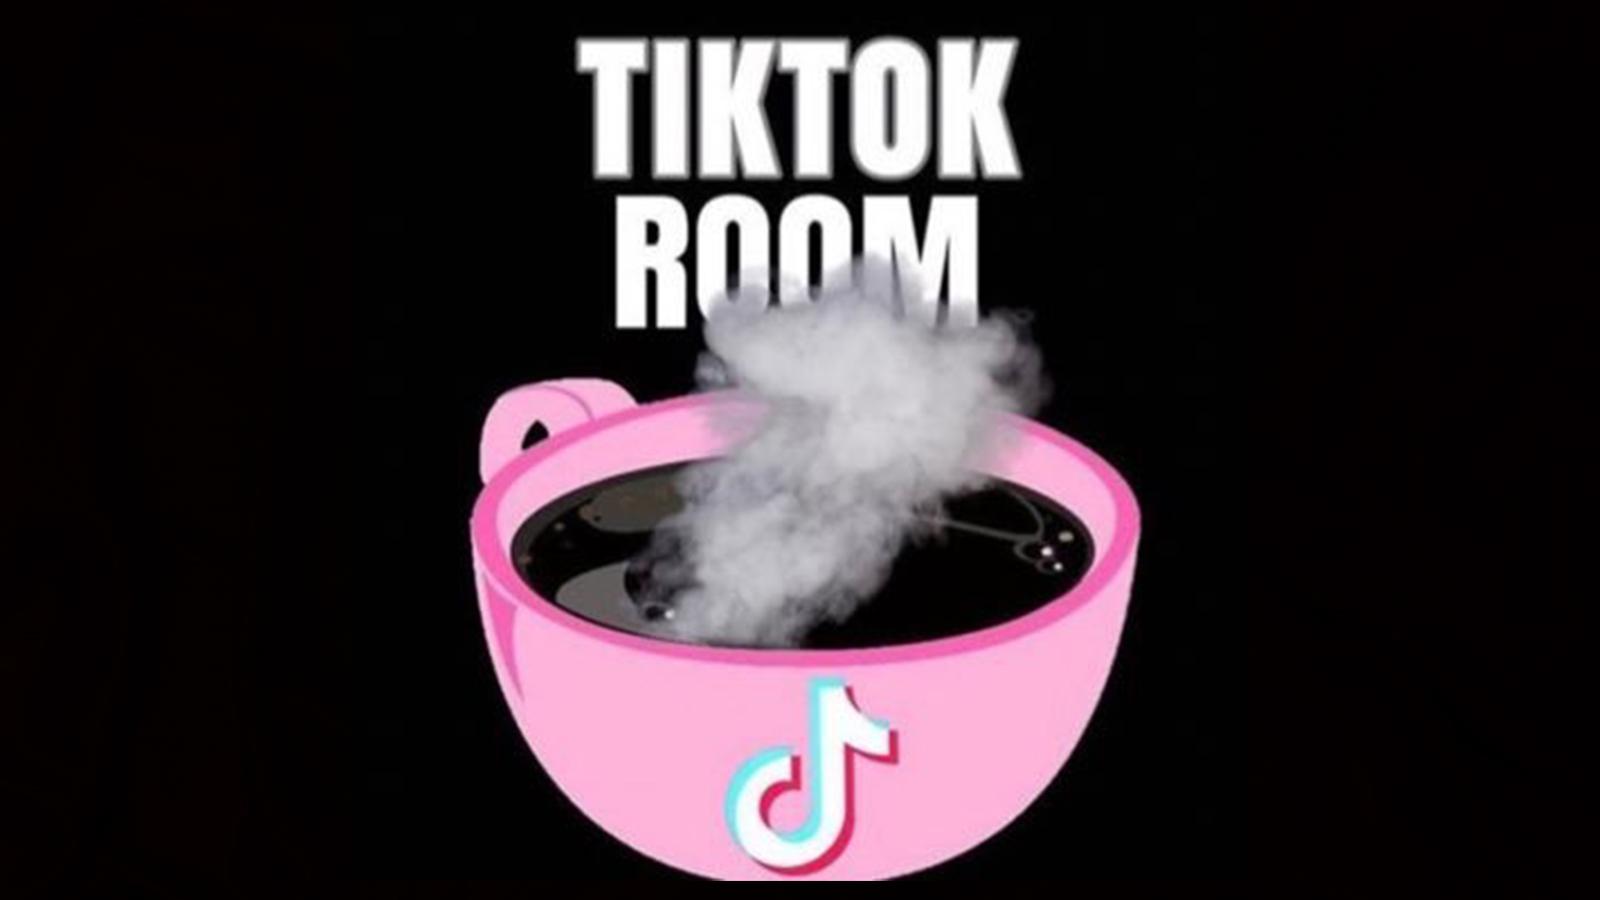 TikTokRoom instagram account disabled